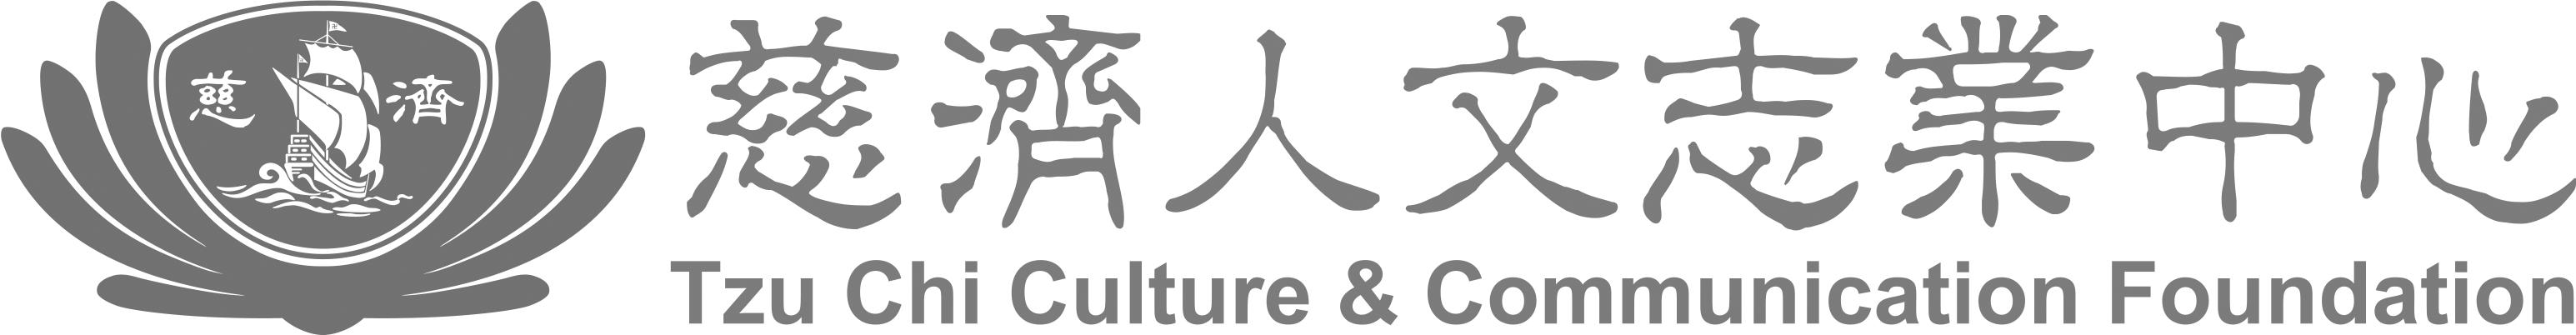 慈濟人文志業中心 │ Tzu Chi Culture & Communication Foundation